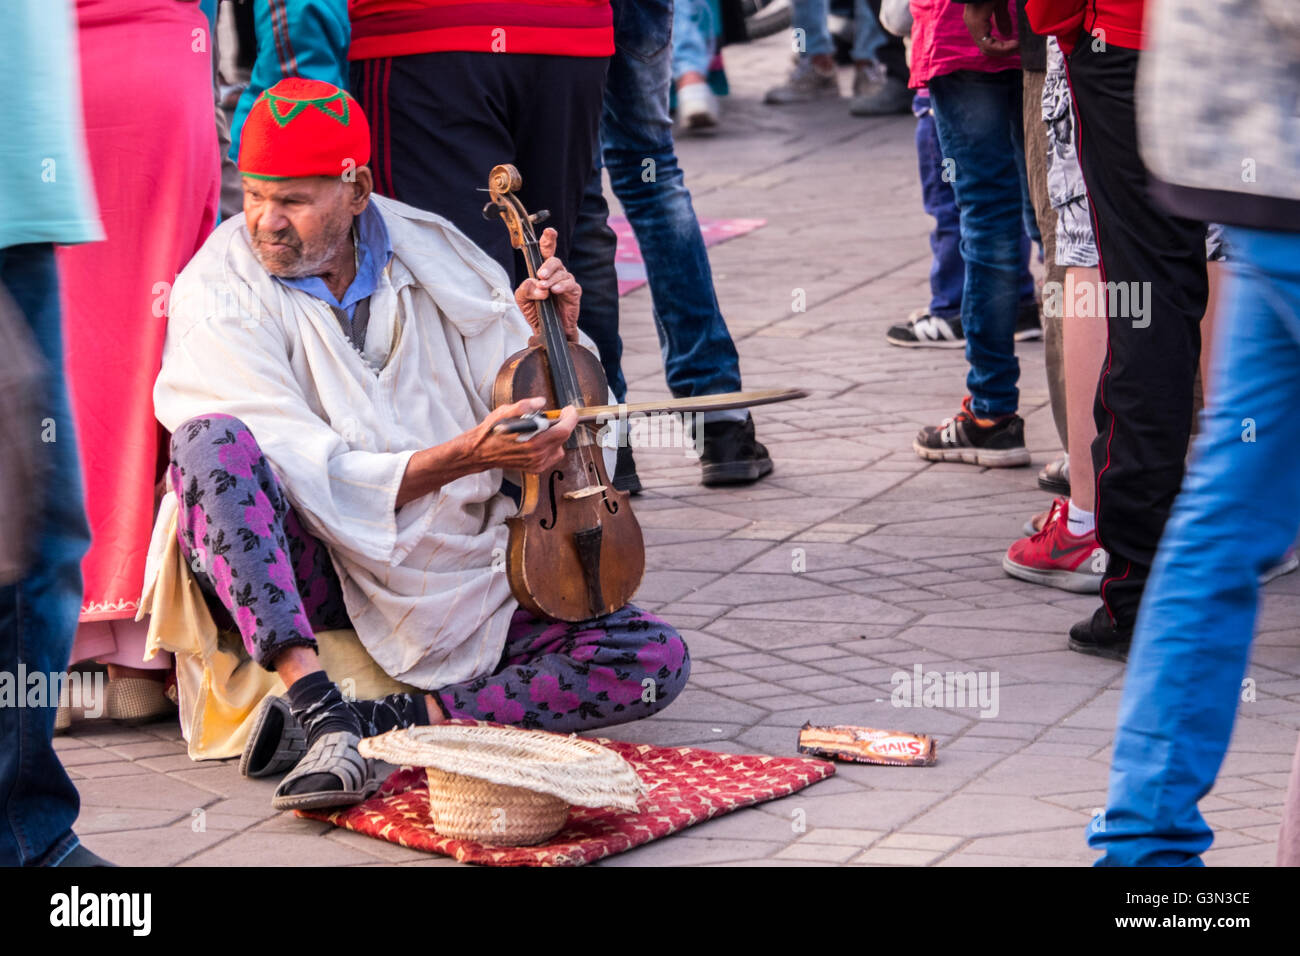 Street entertainer in Jamaa el Fna (Jemaa el-Fnaa, Djema el-Fna  ) the main square in Marrakesh's medina, Morocco - Stock Photo